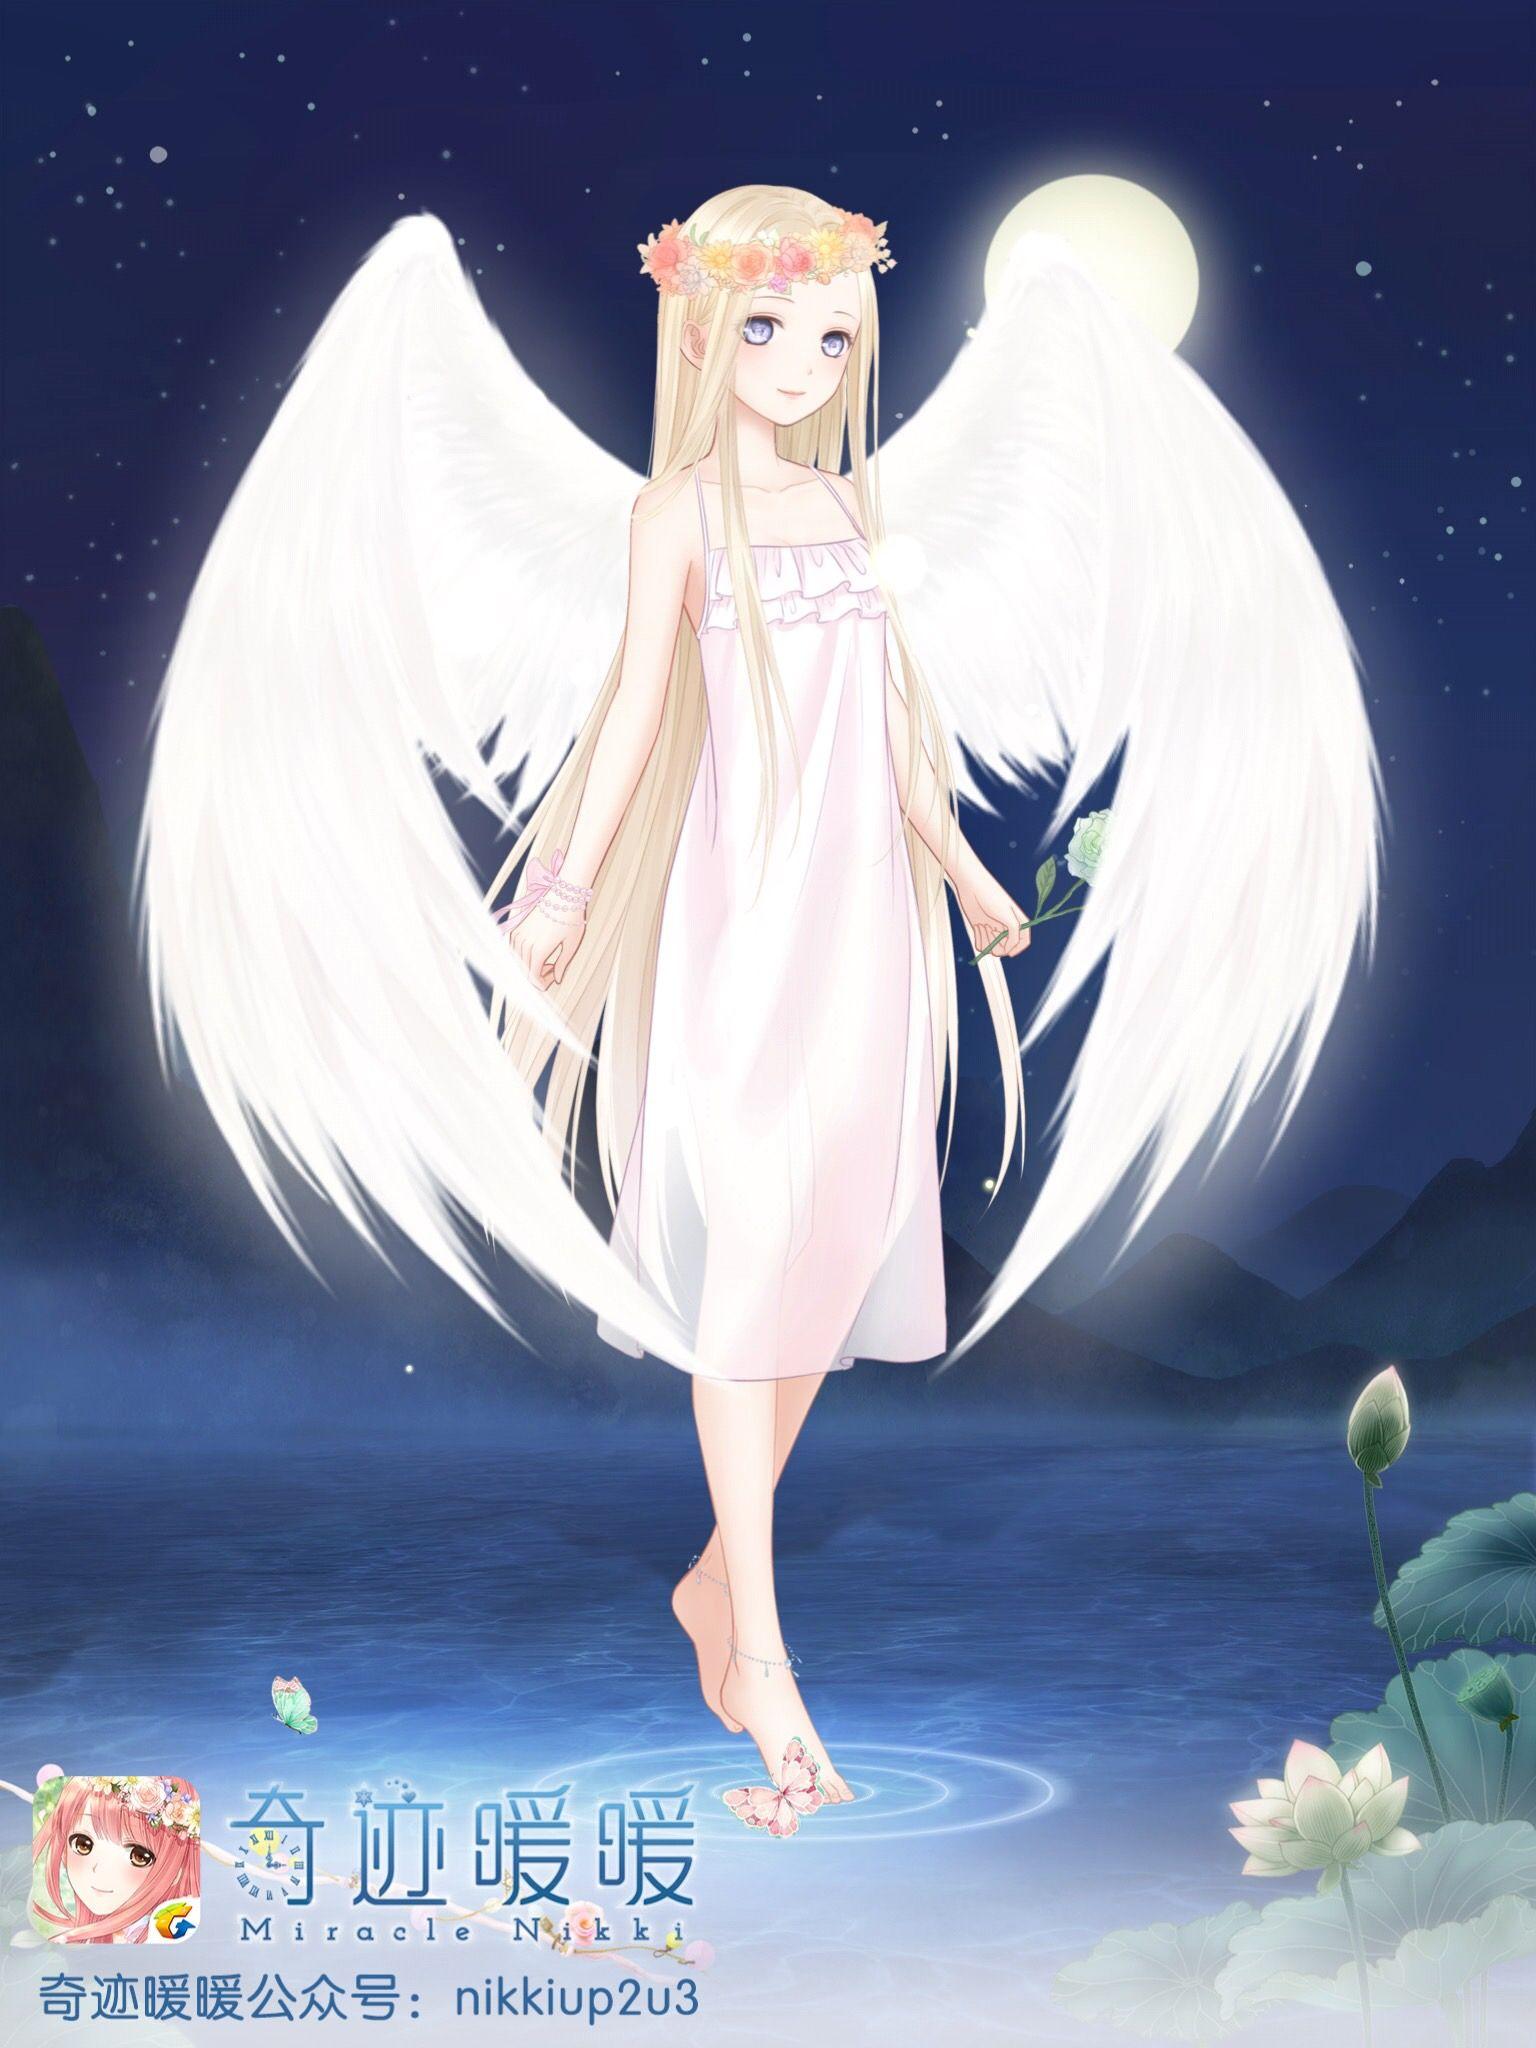 Dessin ange demon manga dessin de manga - Dessin ange demon ...